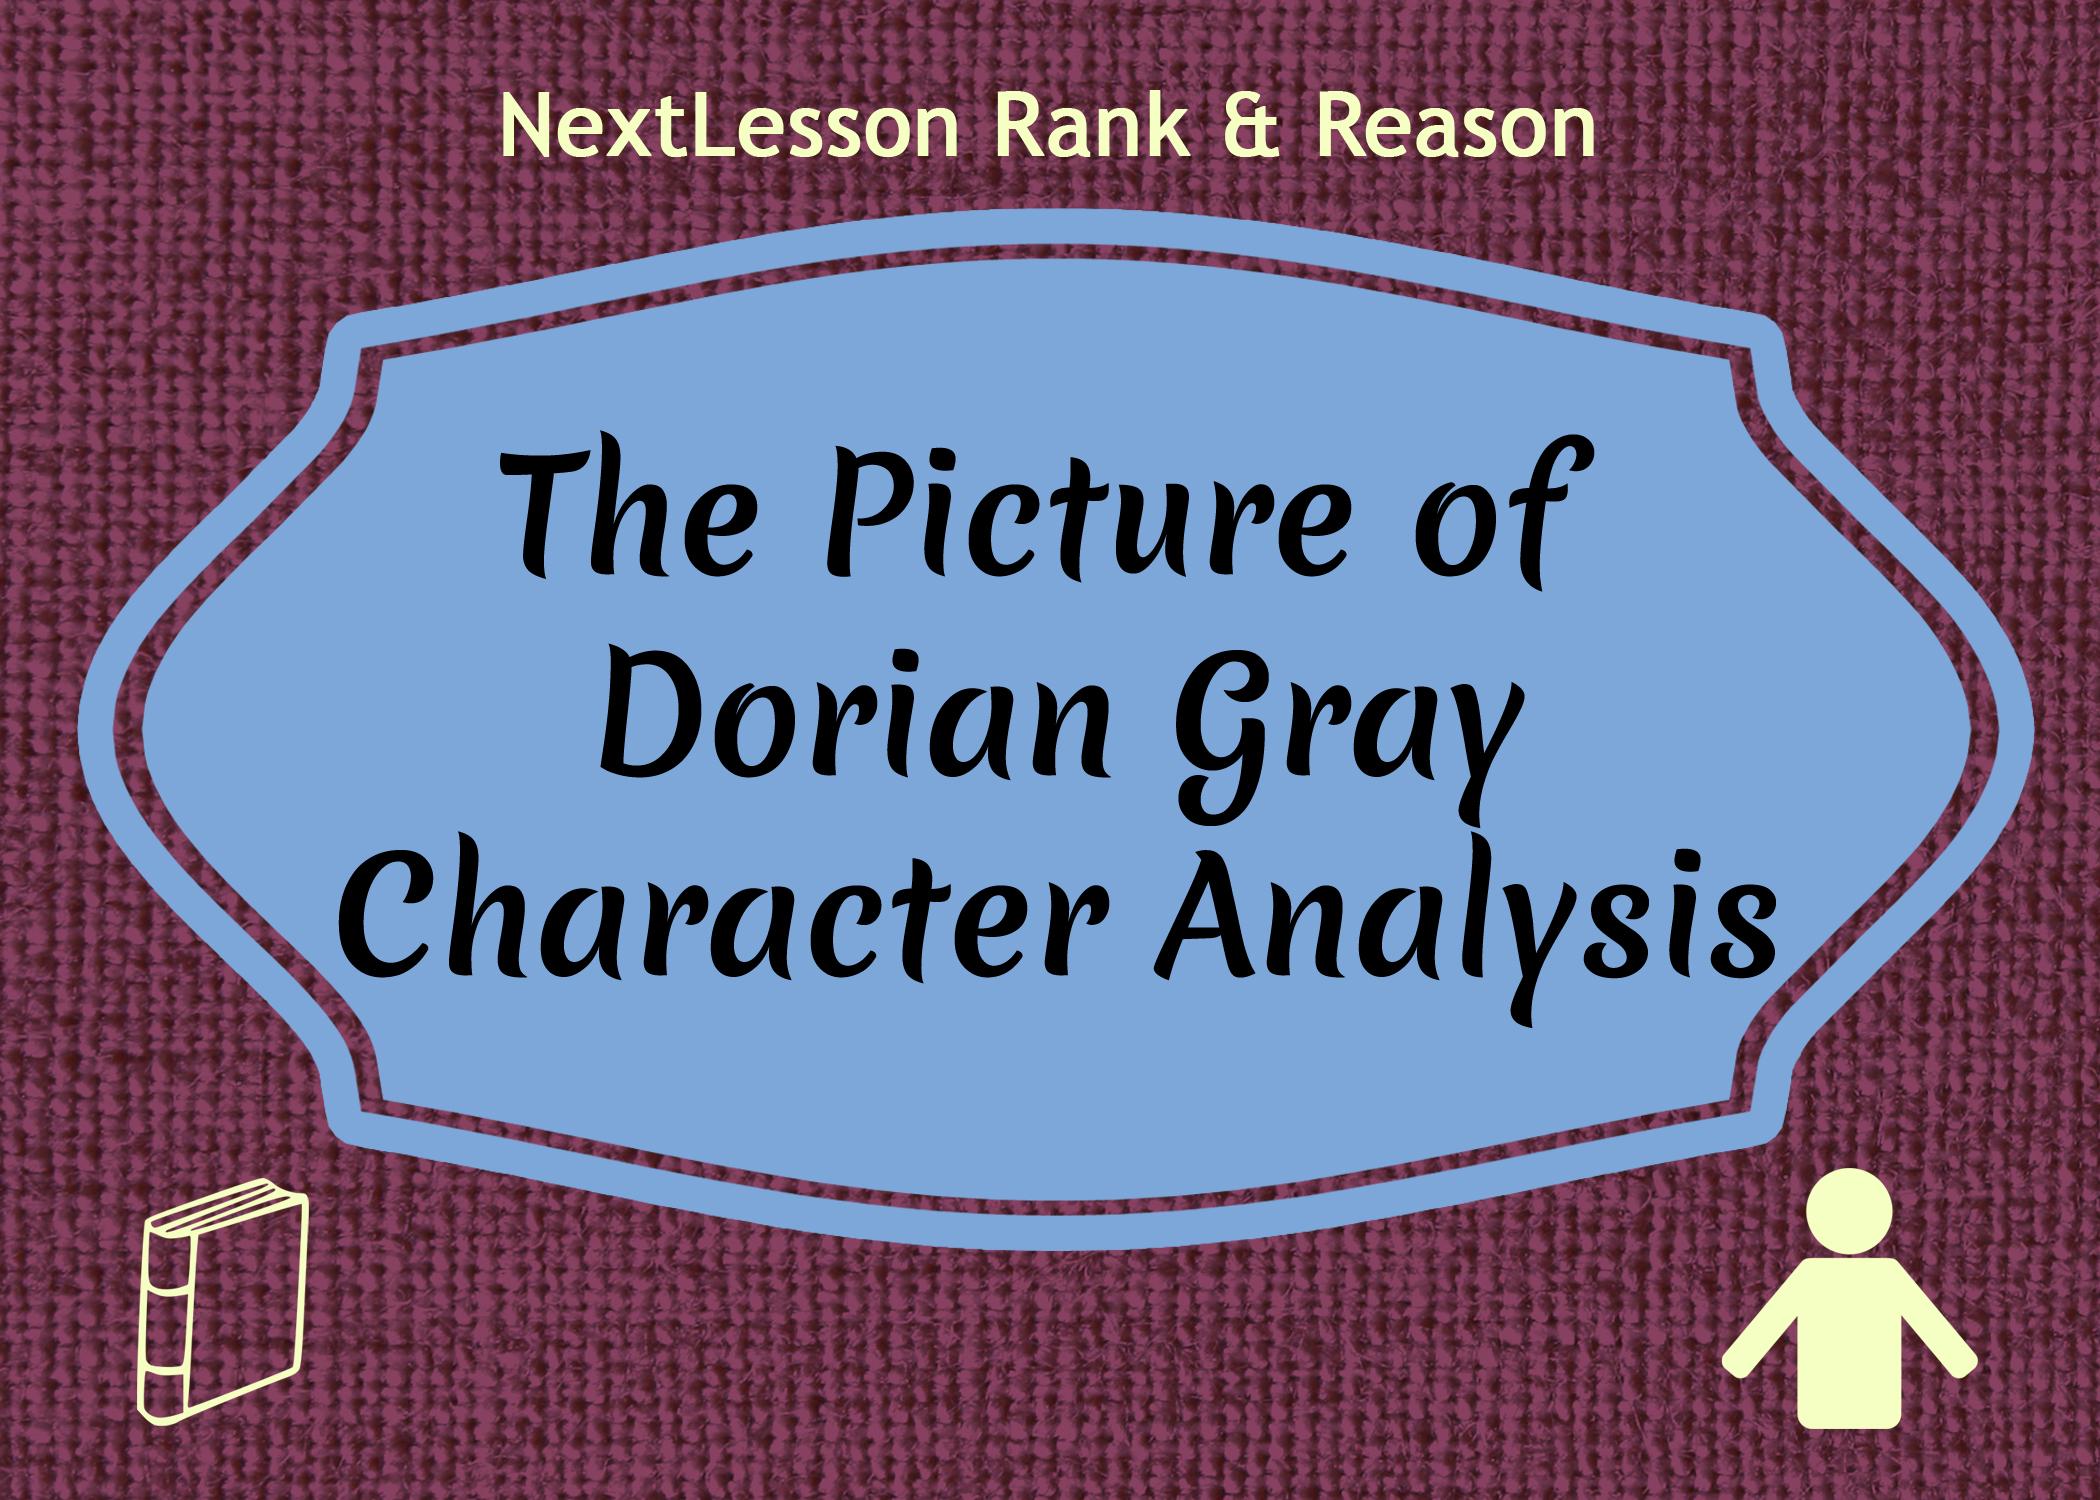 character analysis essay dorian gray